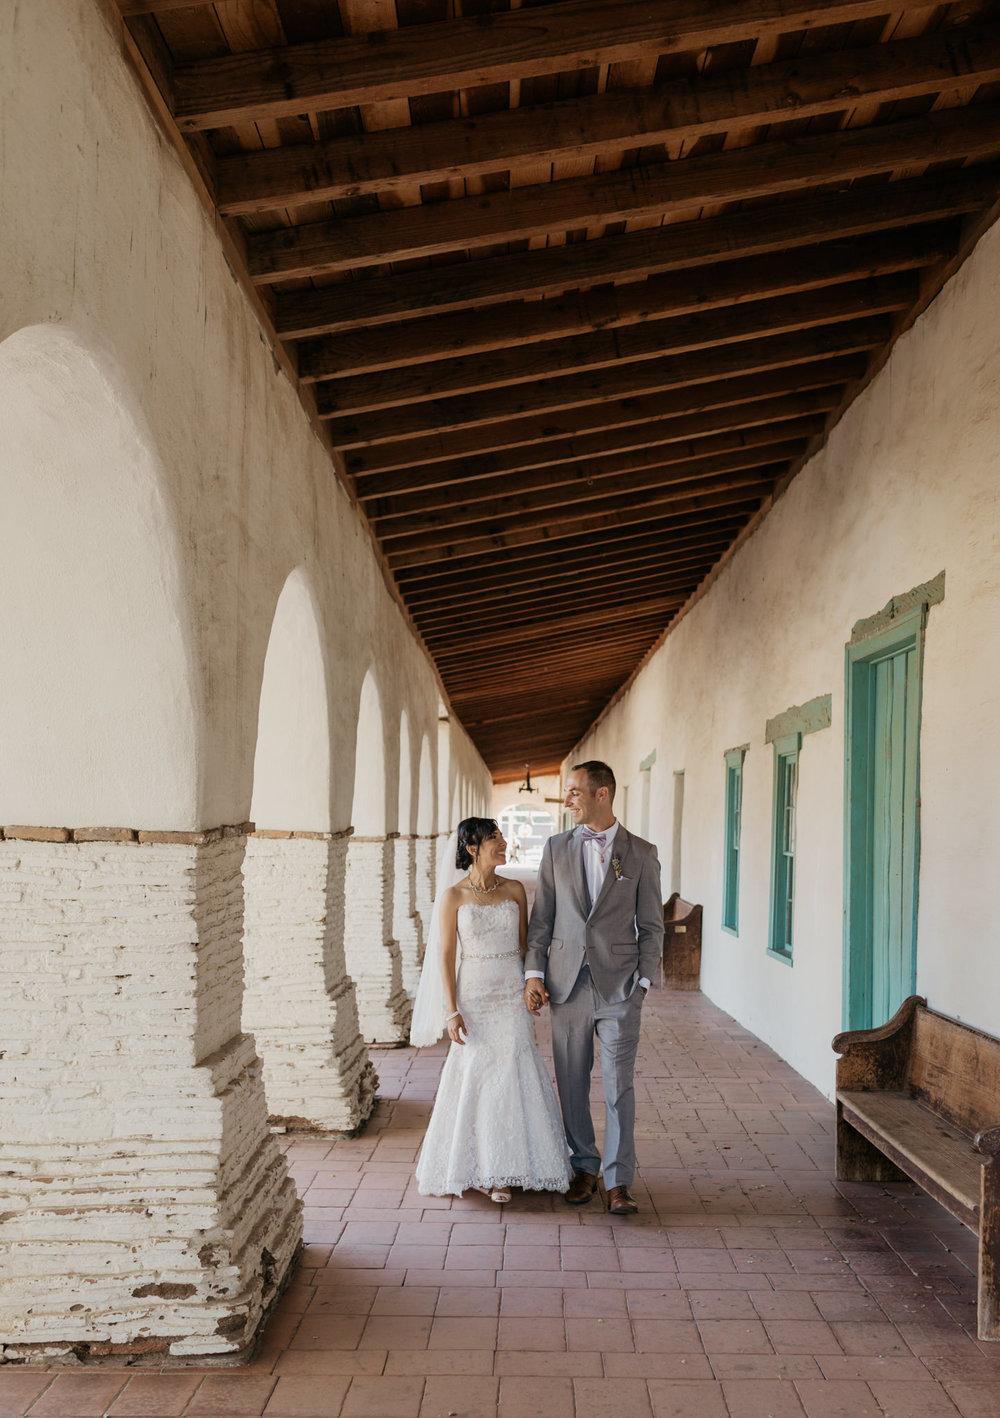 San Juan Bautista Church Wedding Bride Groom Walking